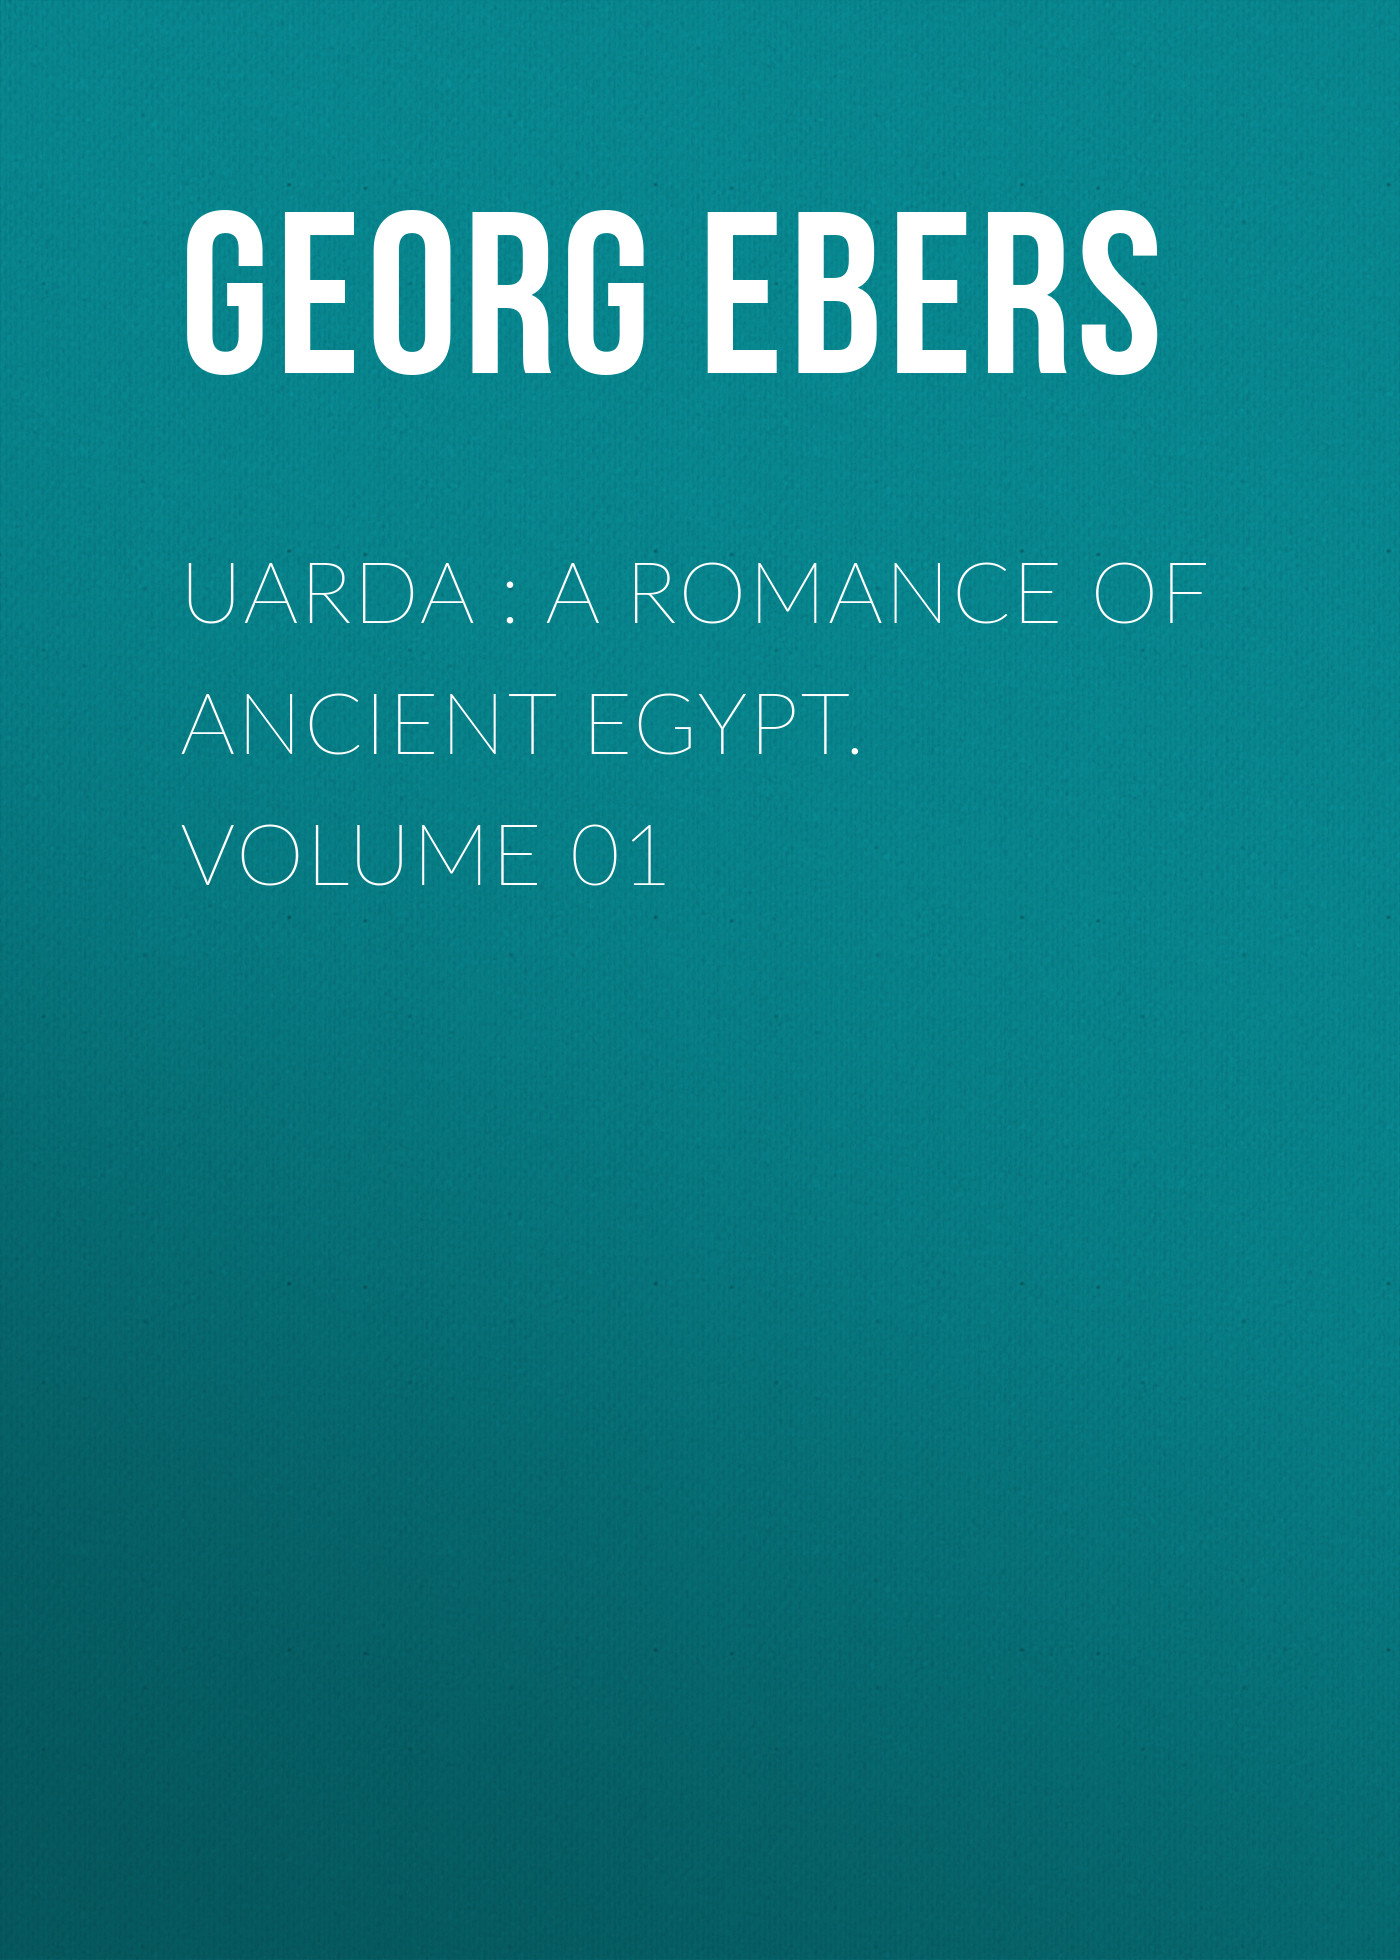 Georg Ebers Uarda : a Romance of Ancient Egypt. Volume 01 ancient egypt